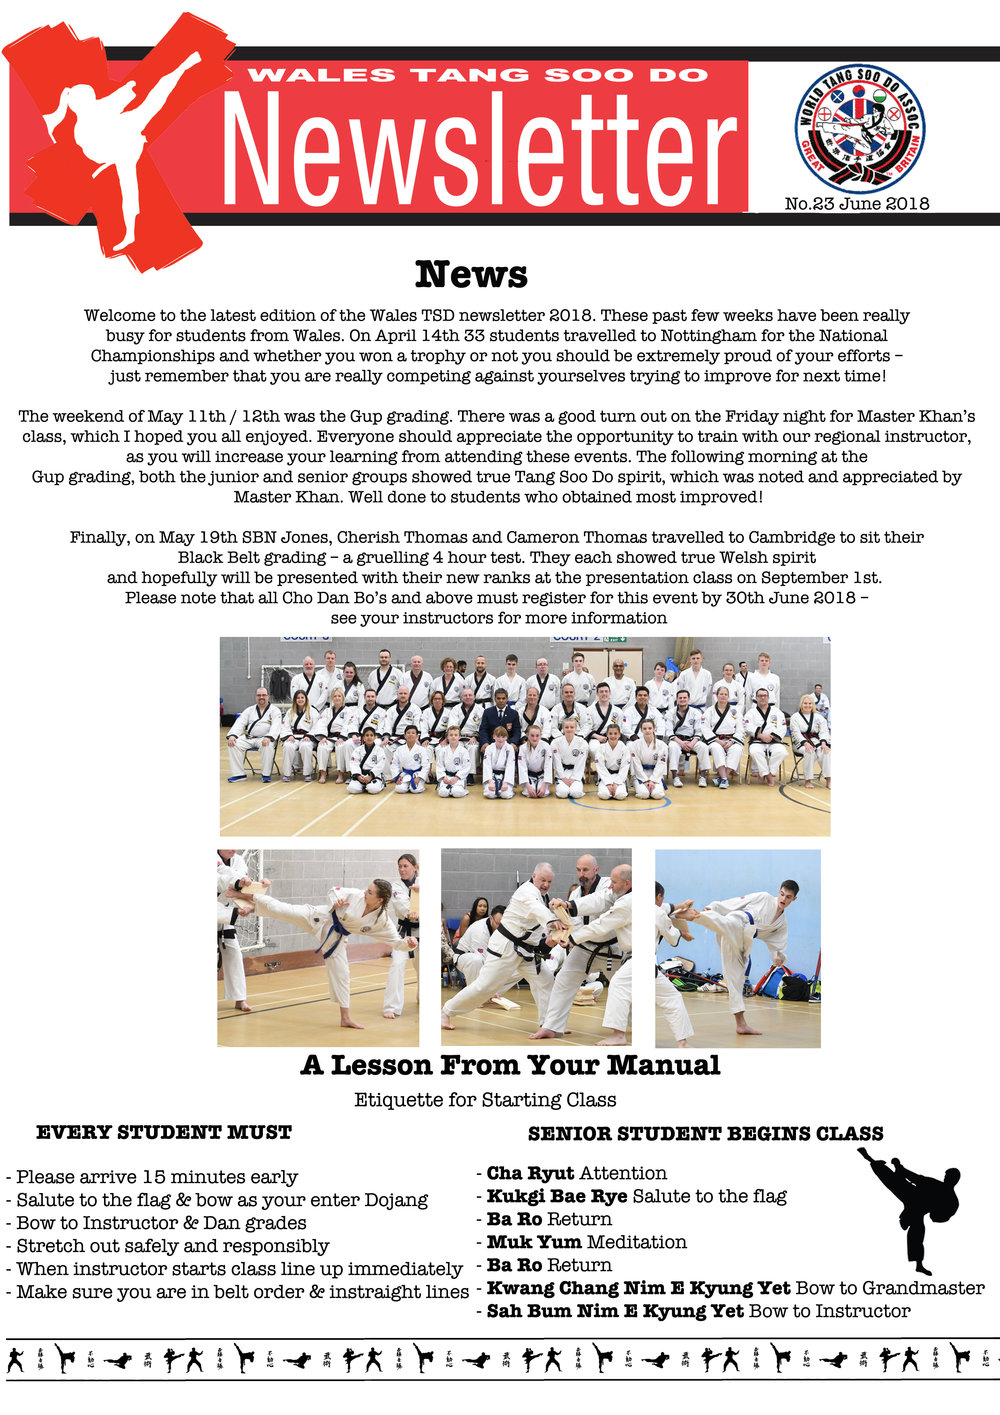 Wales Newsletter.jpg